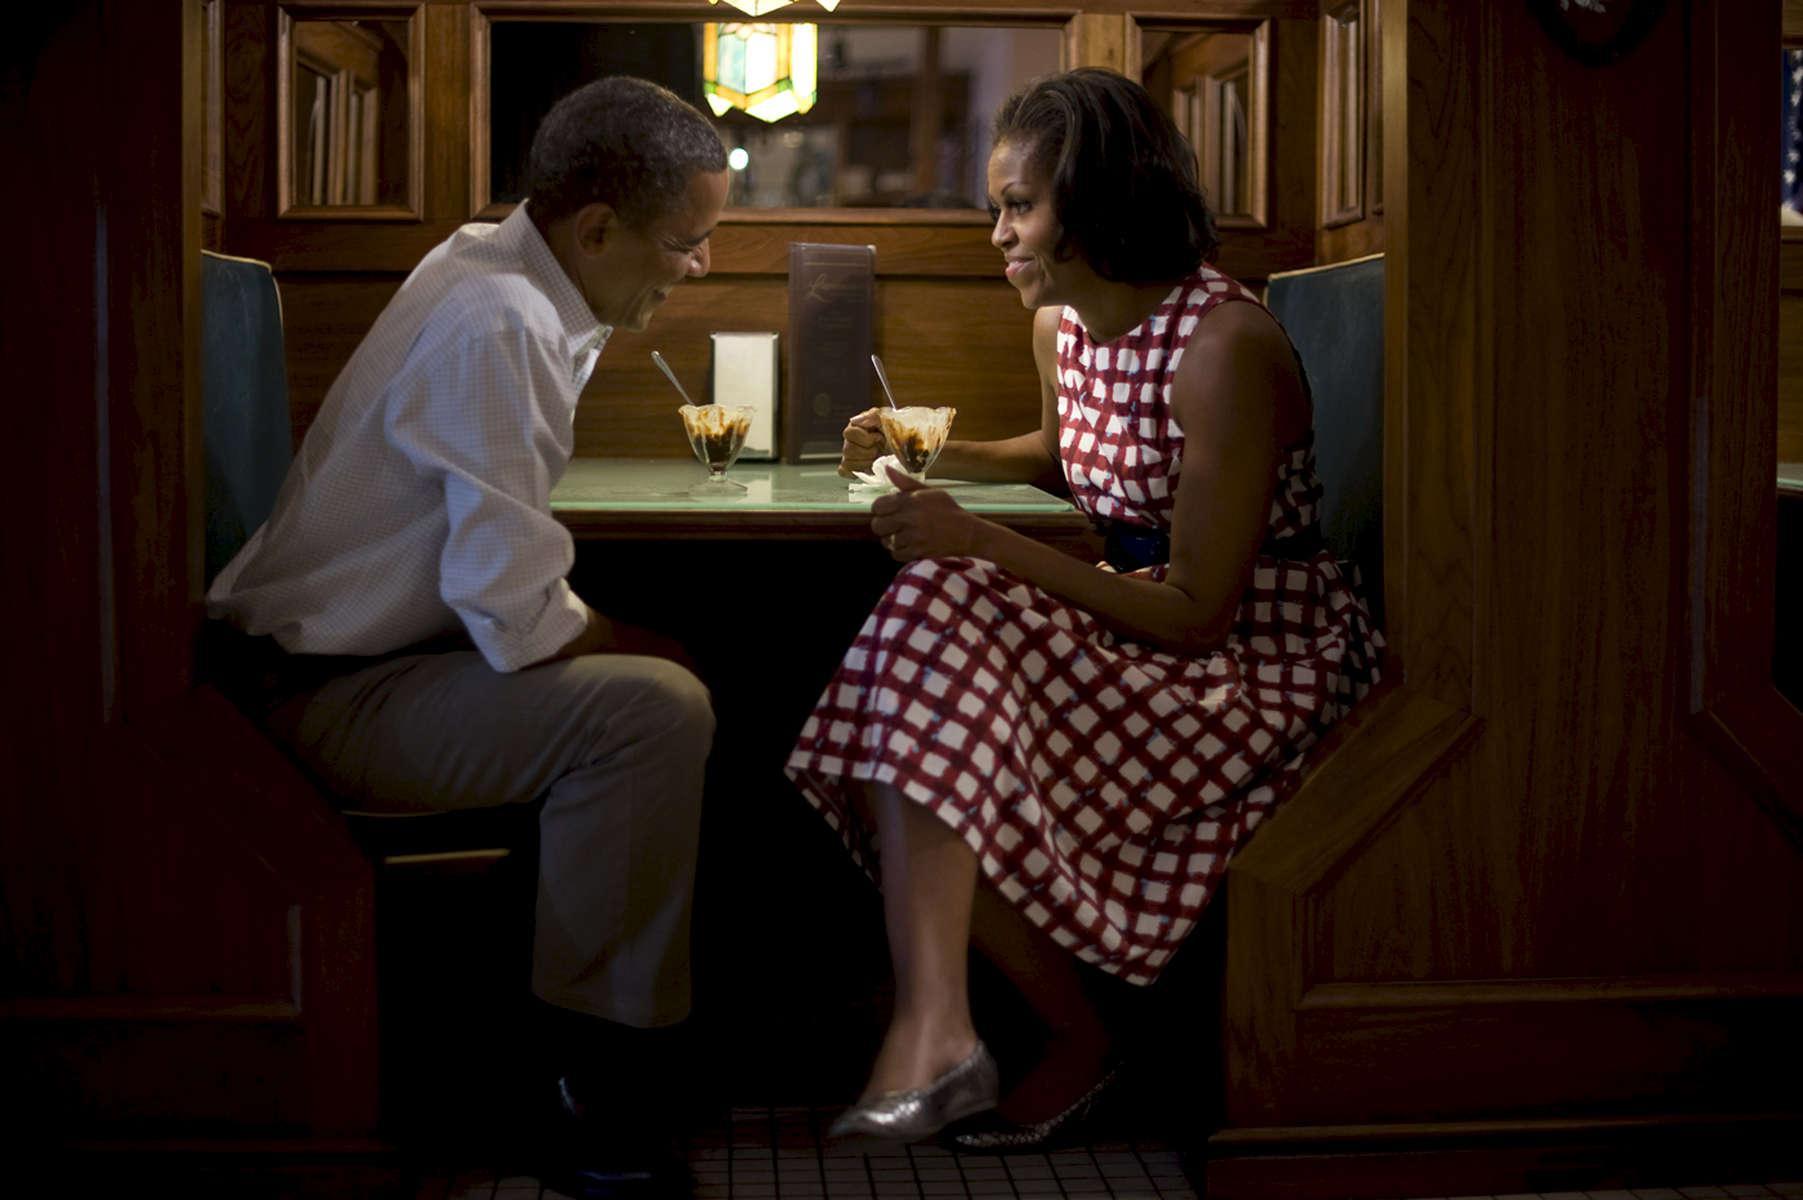 August 15, 2012- DAVENPORT, IA: First Lady Michelle Obama and President Barack Obama share ice cream sundaes at Logomarcino's Ice Cream Shoppe in Davenport, Iowa. (Scout Tufankjian for Obama for America/Polaris)